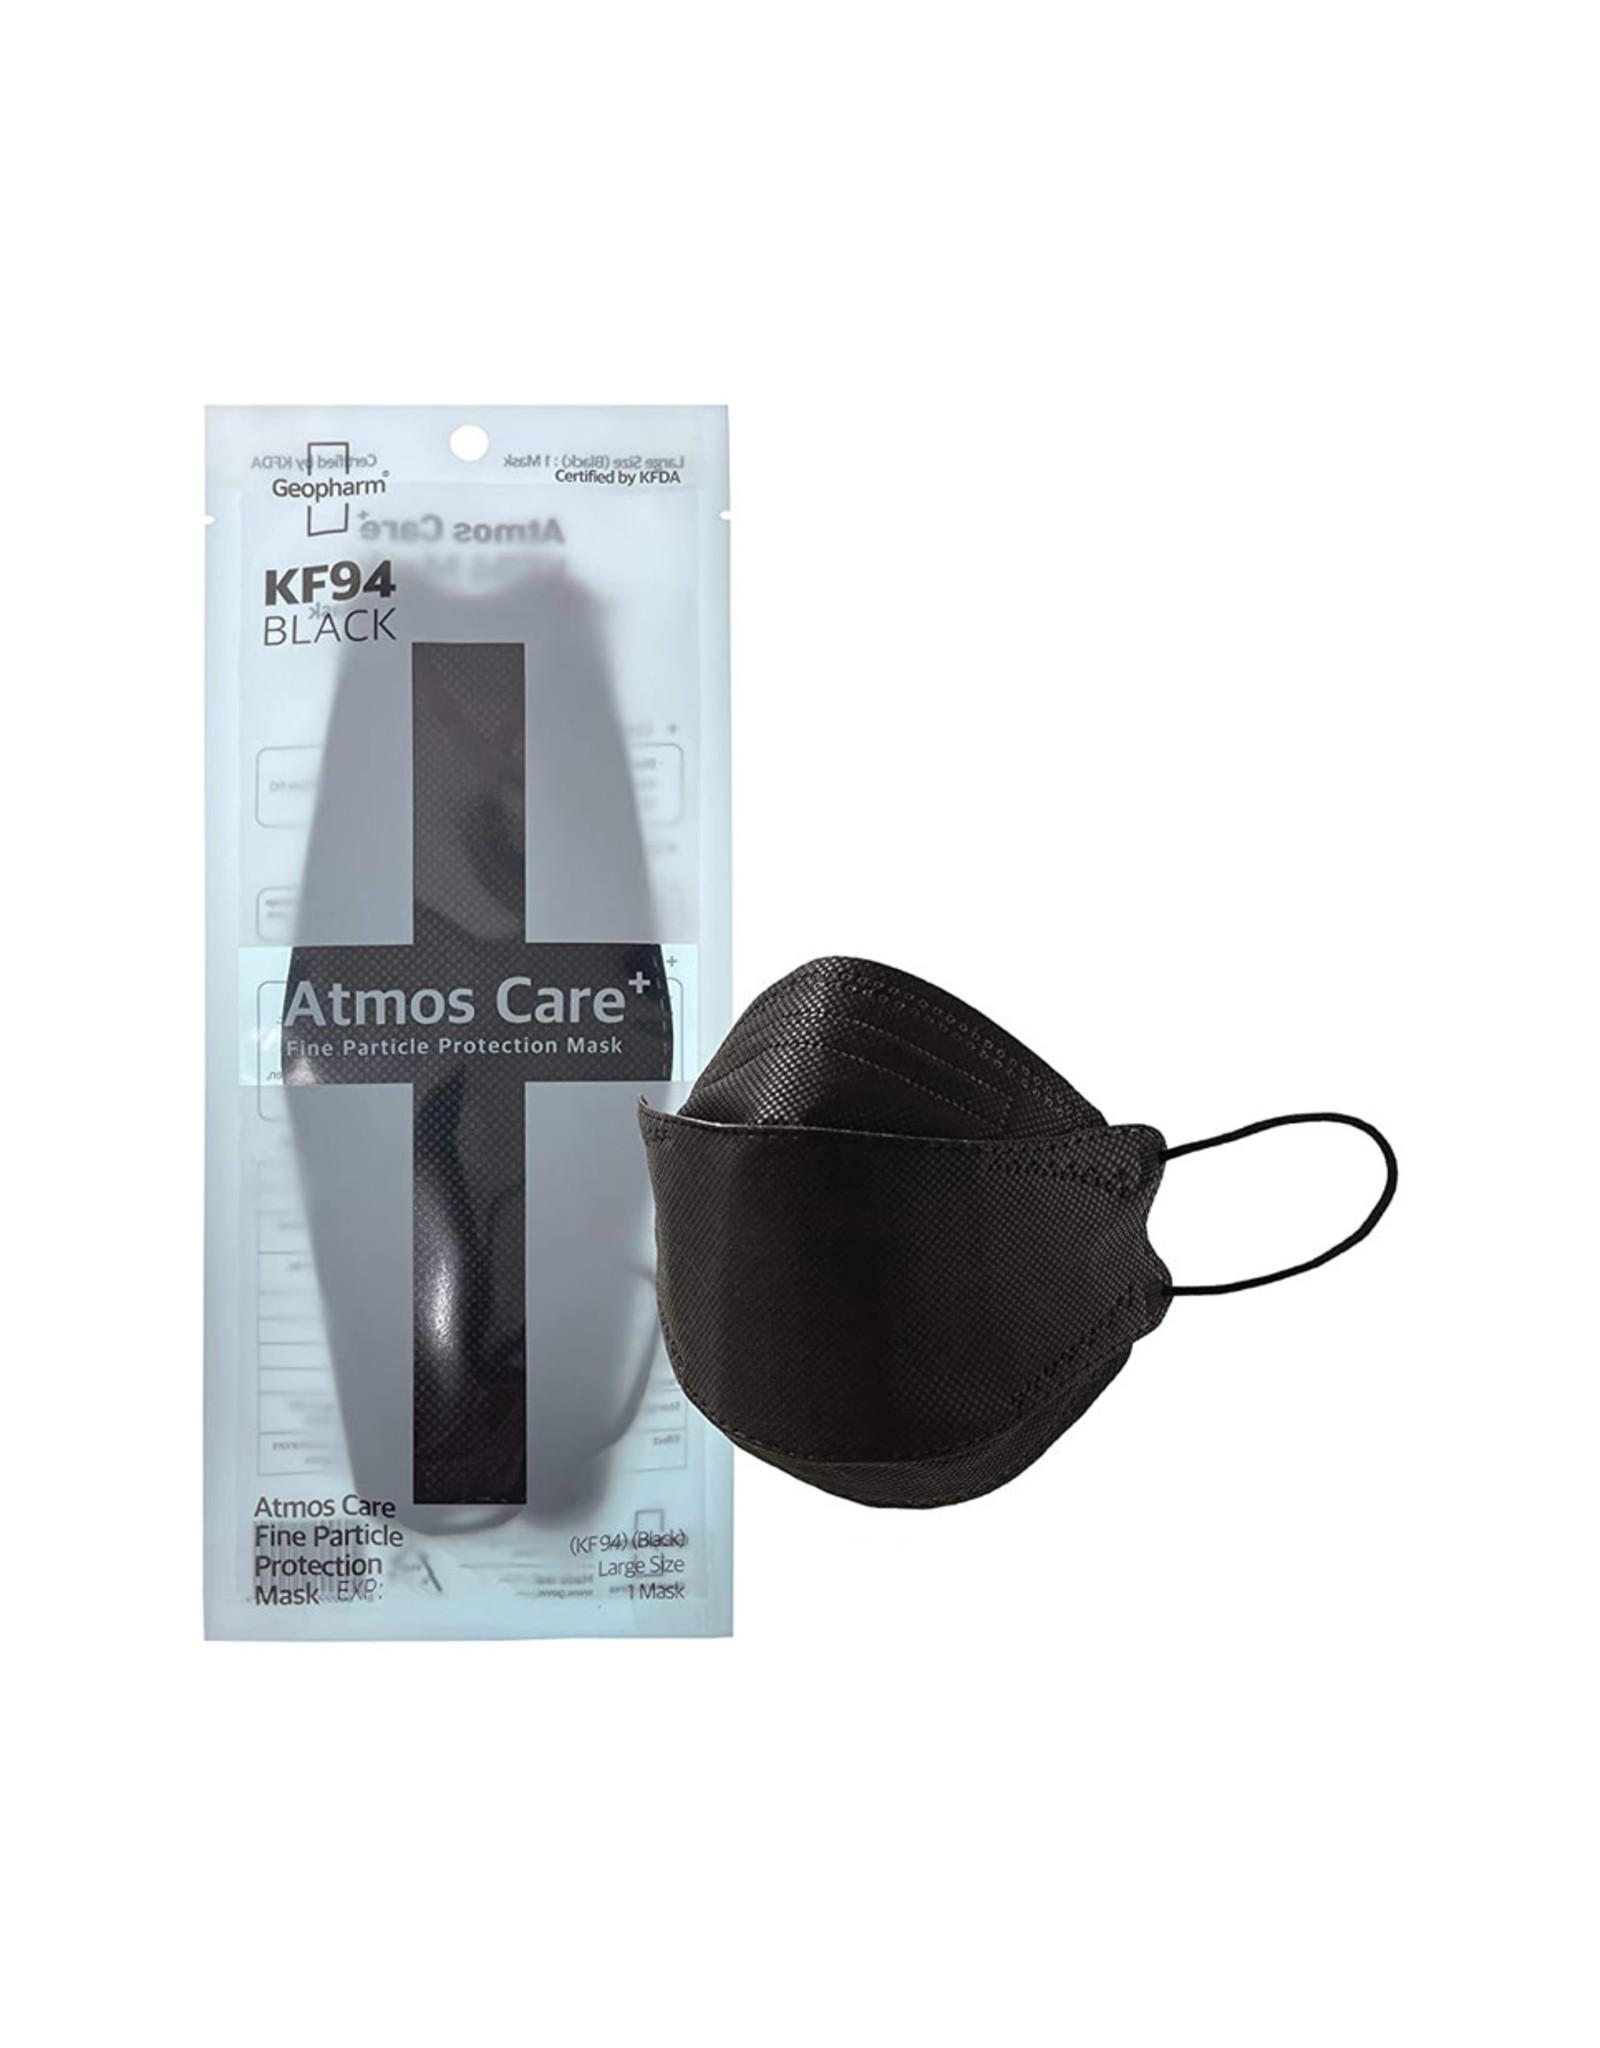 Geopharm Atmos Care+ KF94 Protection Black Mask 1pc